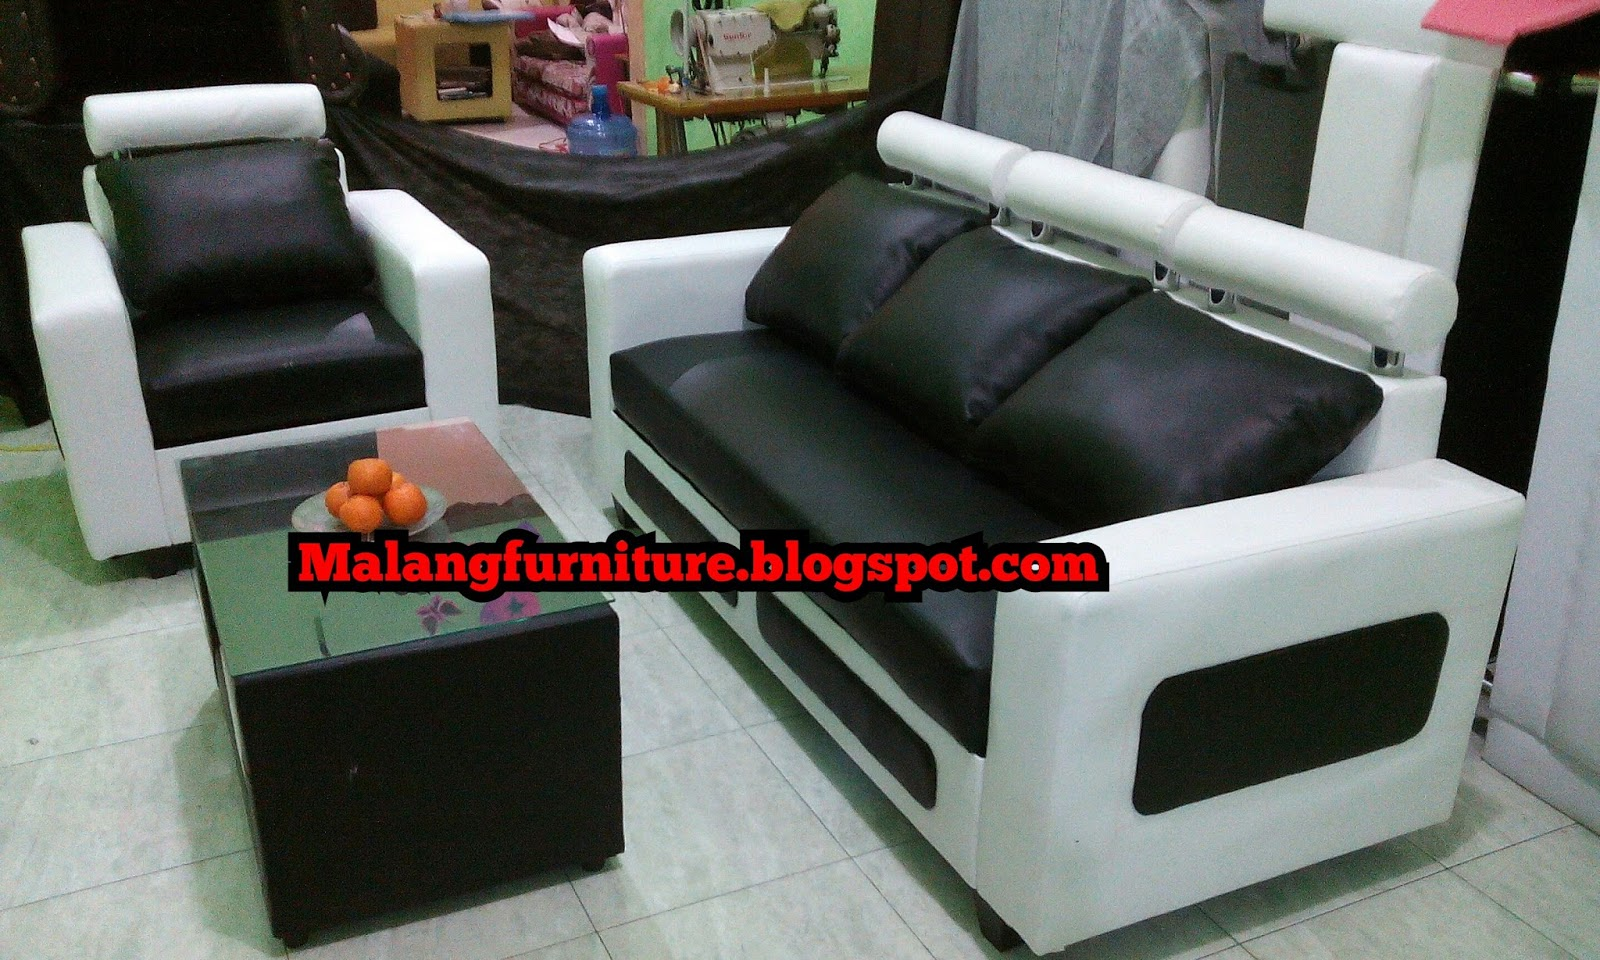 Harga Sofa Puff Murah Review Home Co